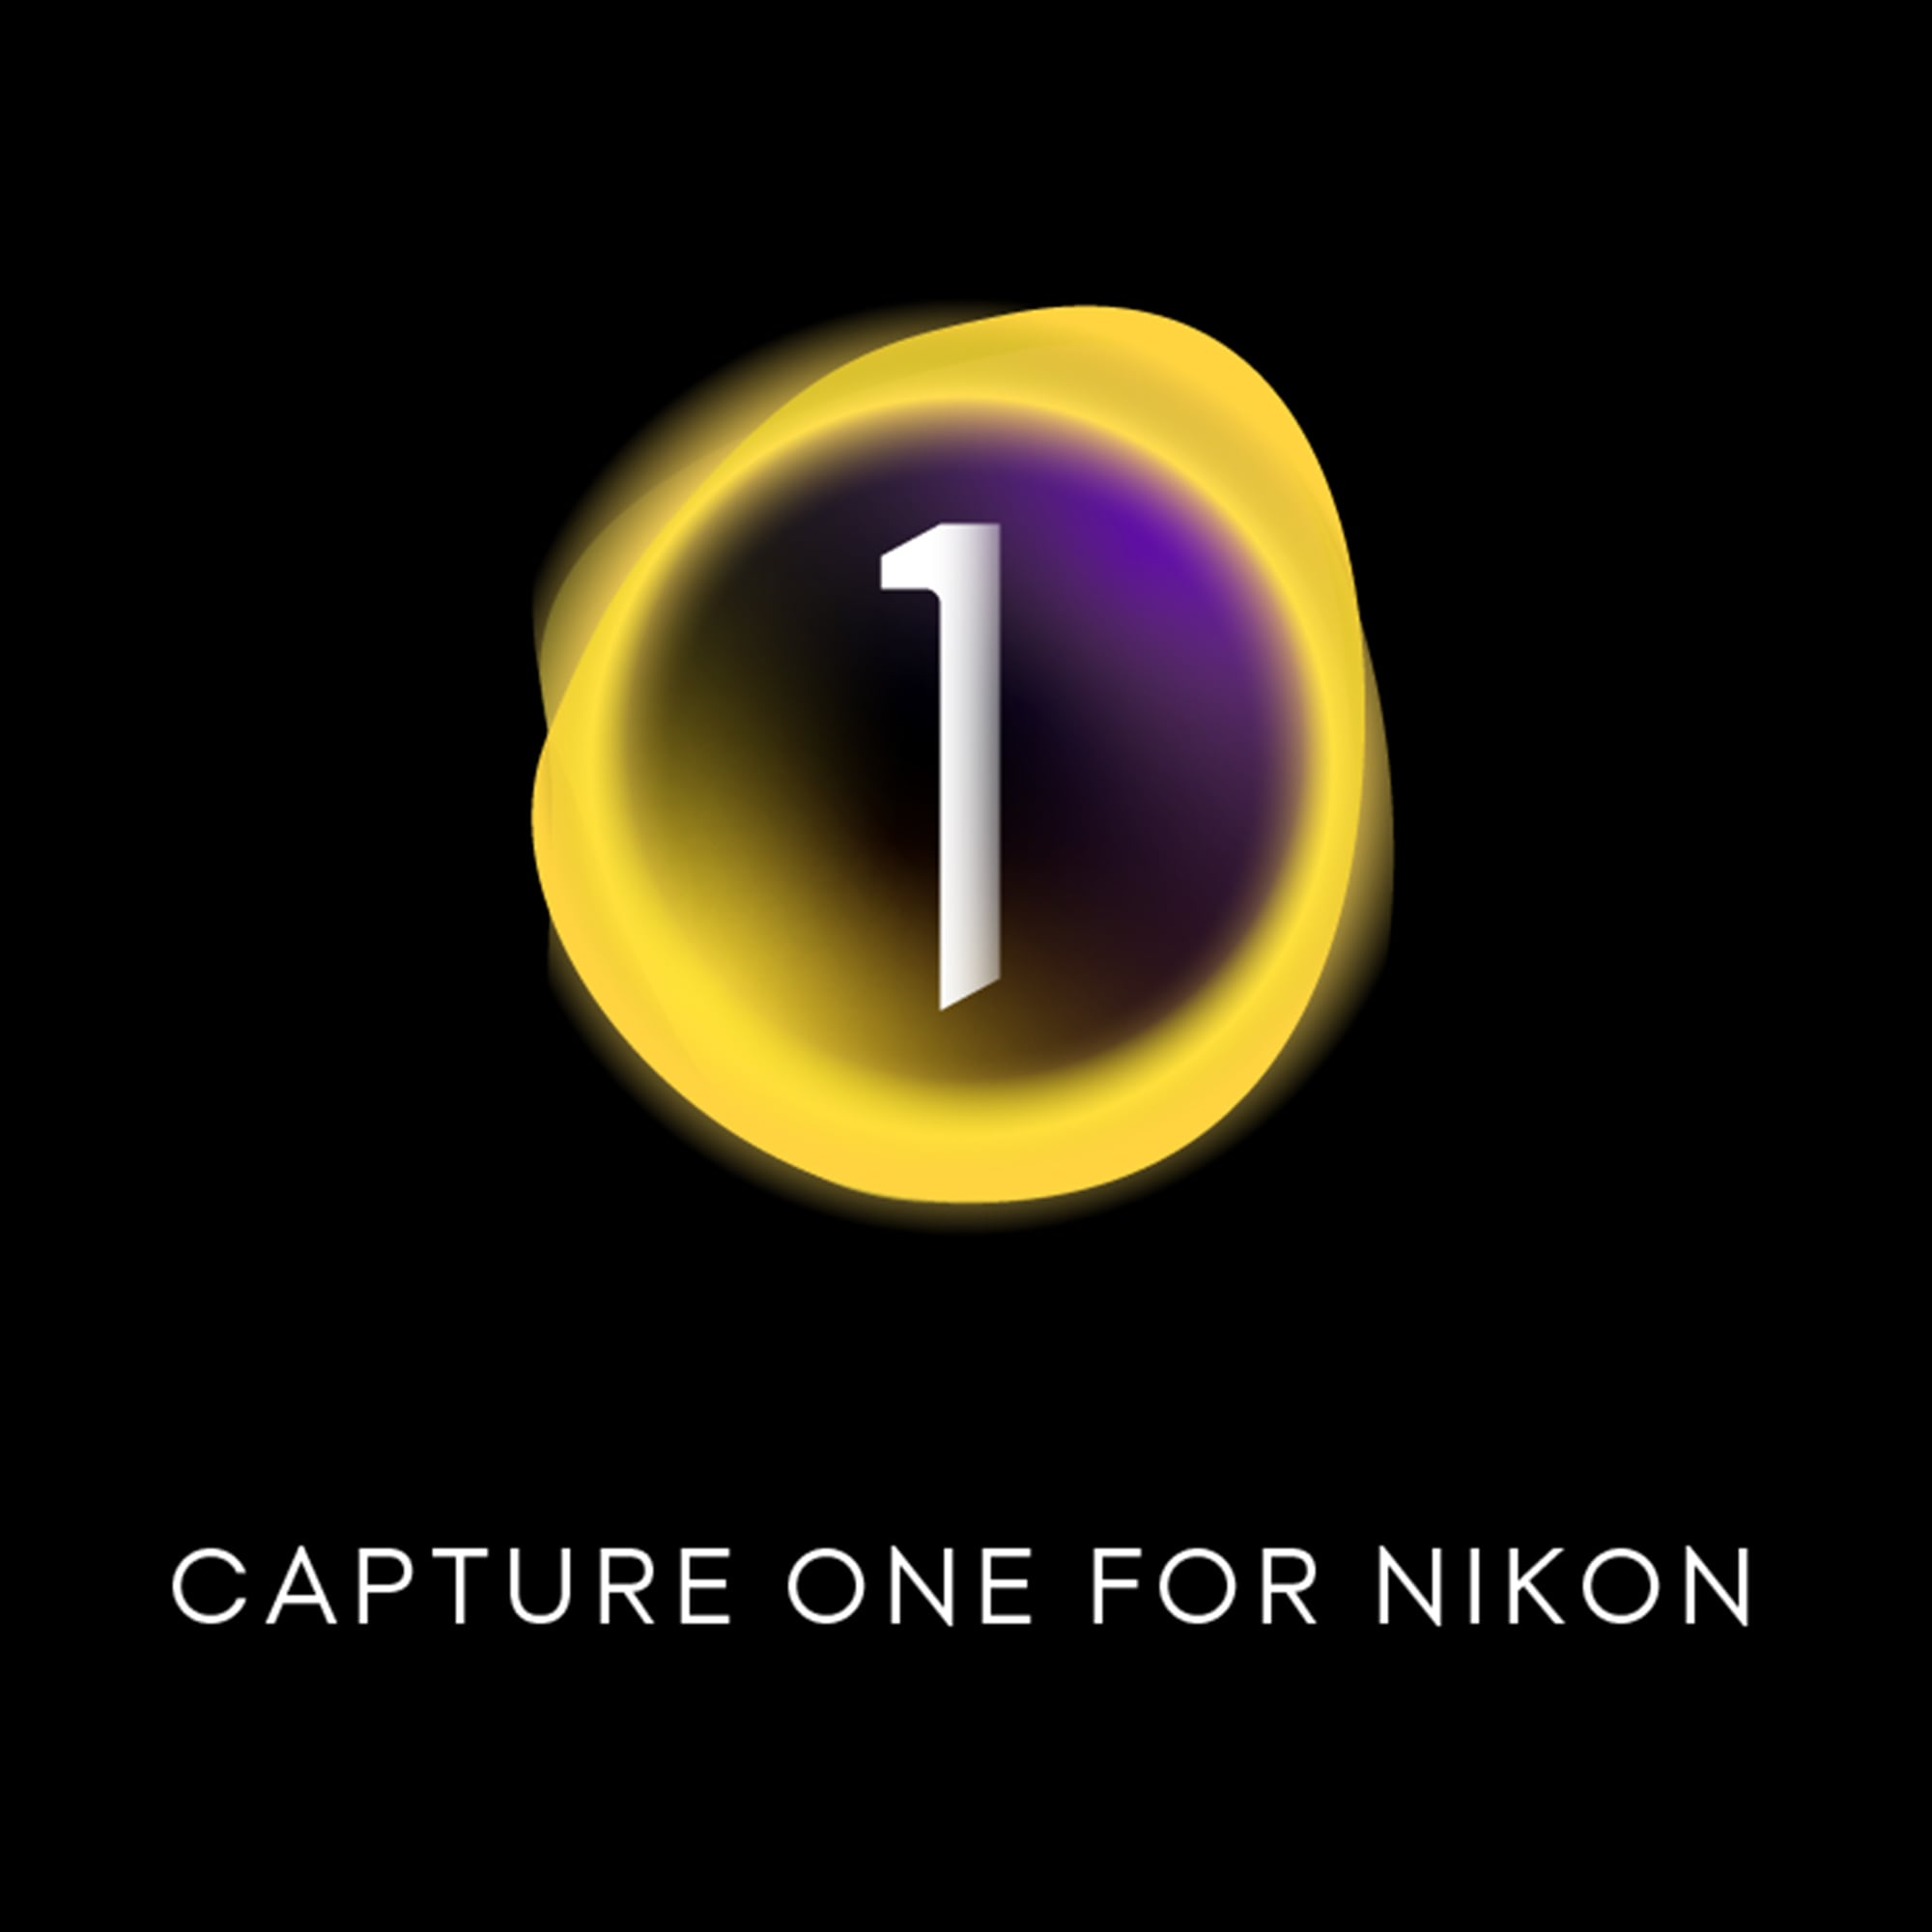 Capture One Pro 20 Till Nikon